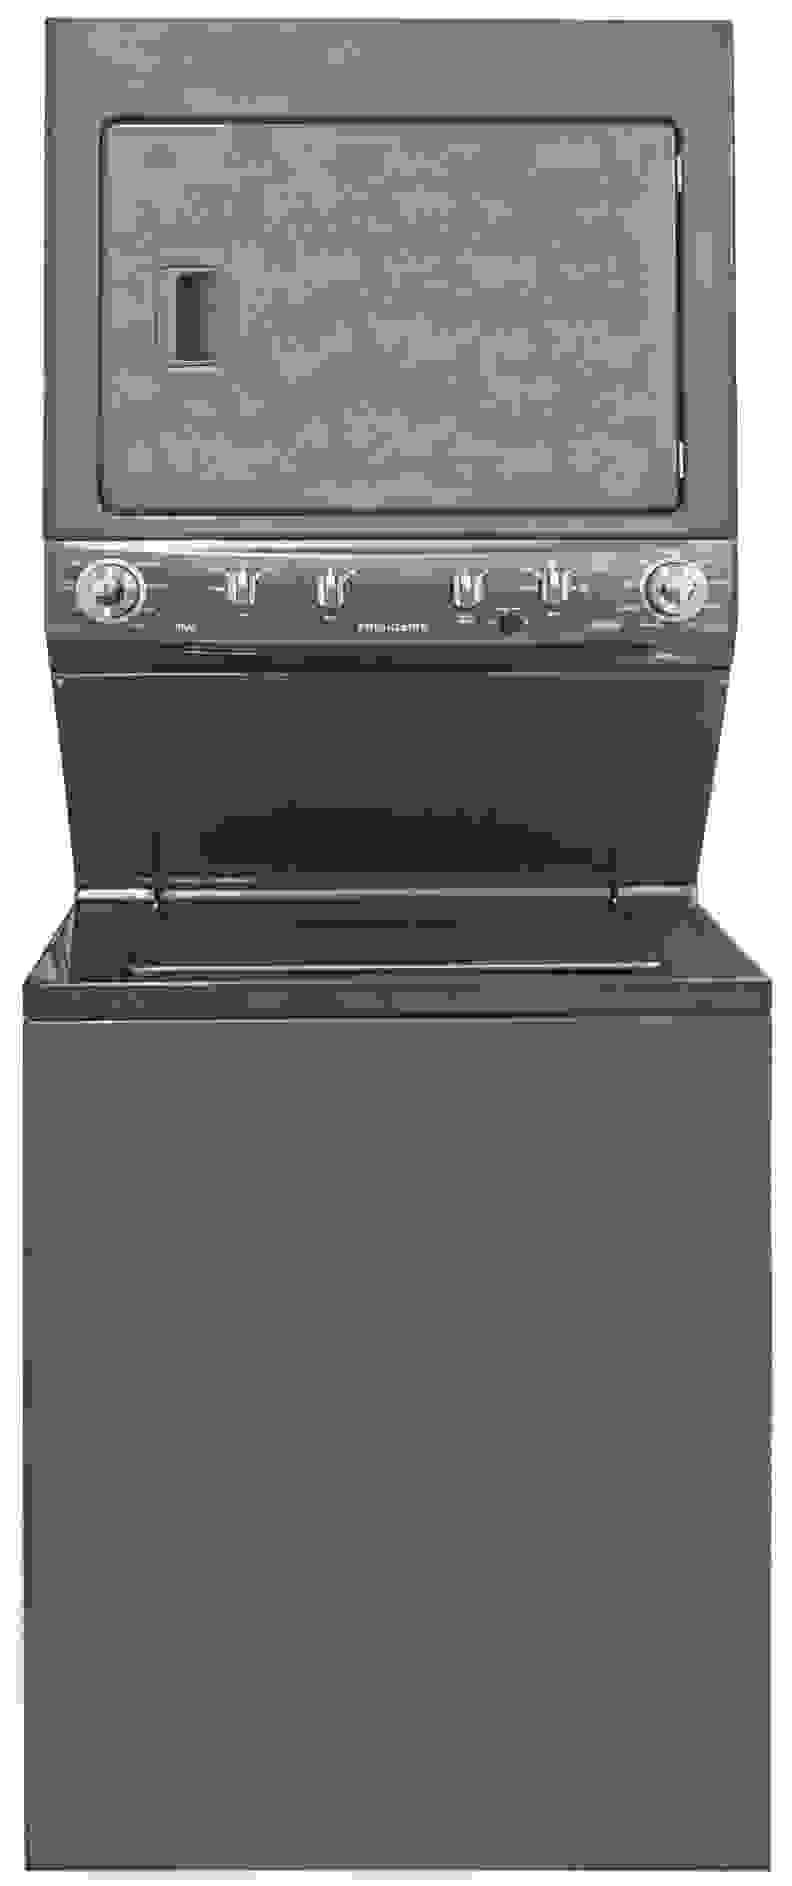 Frigidaire FFLE4033QT Front